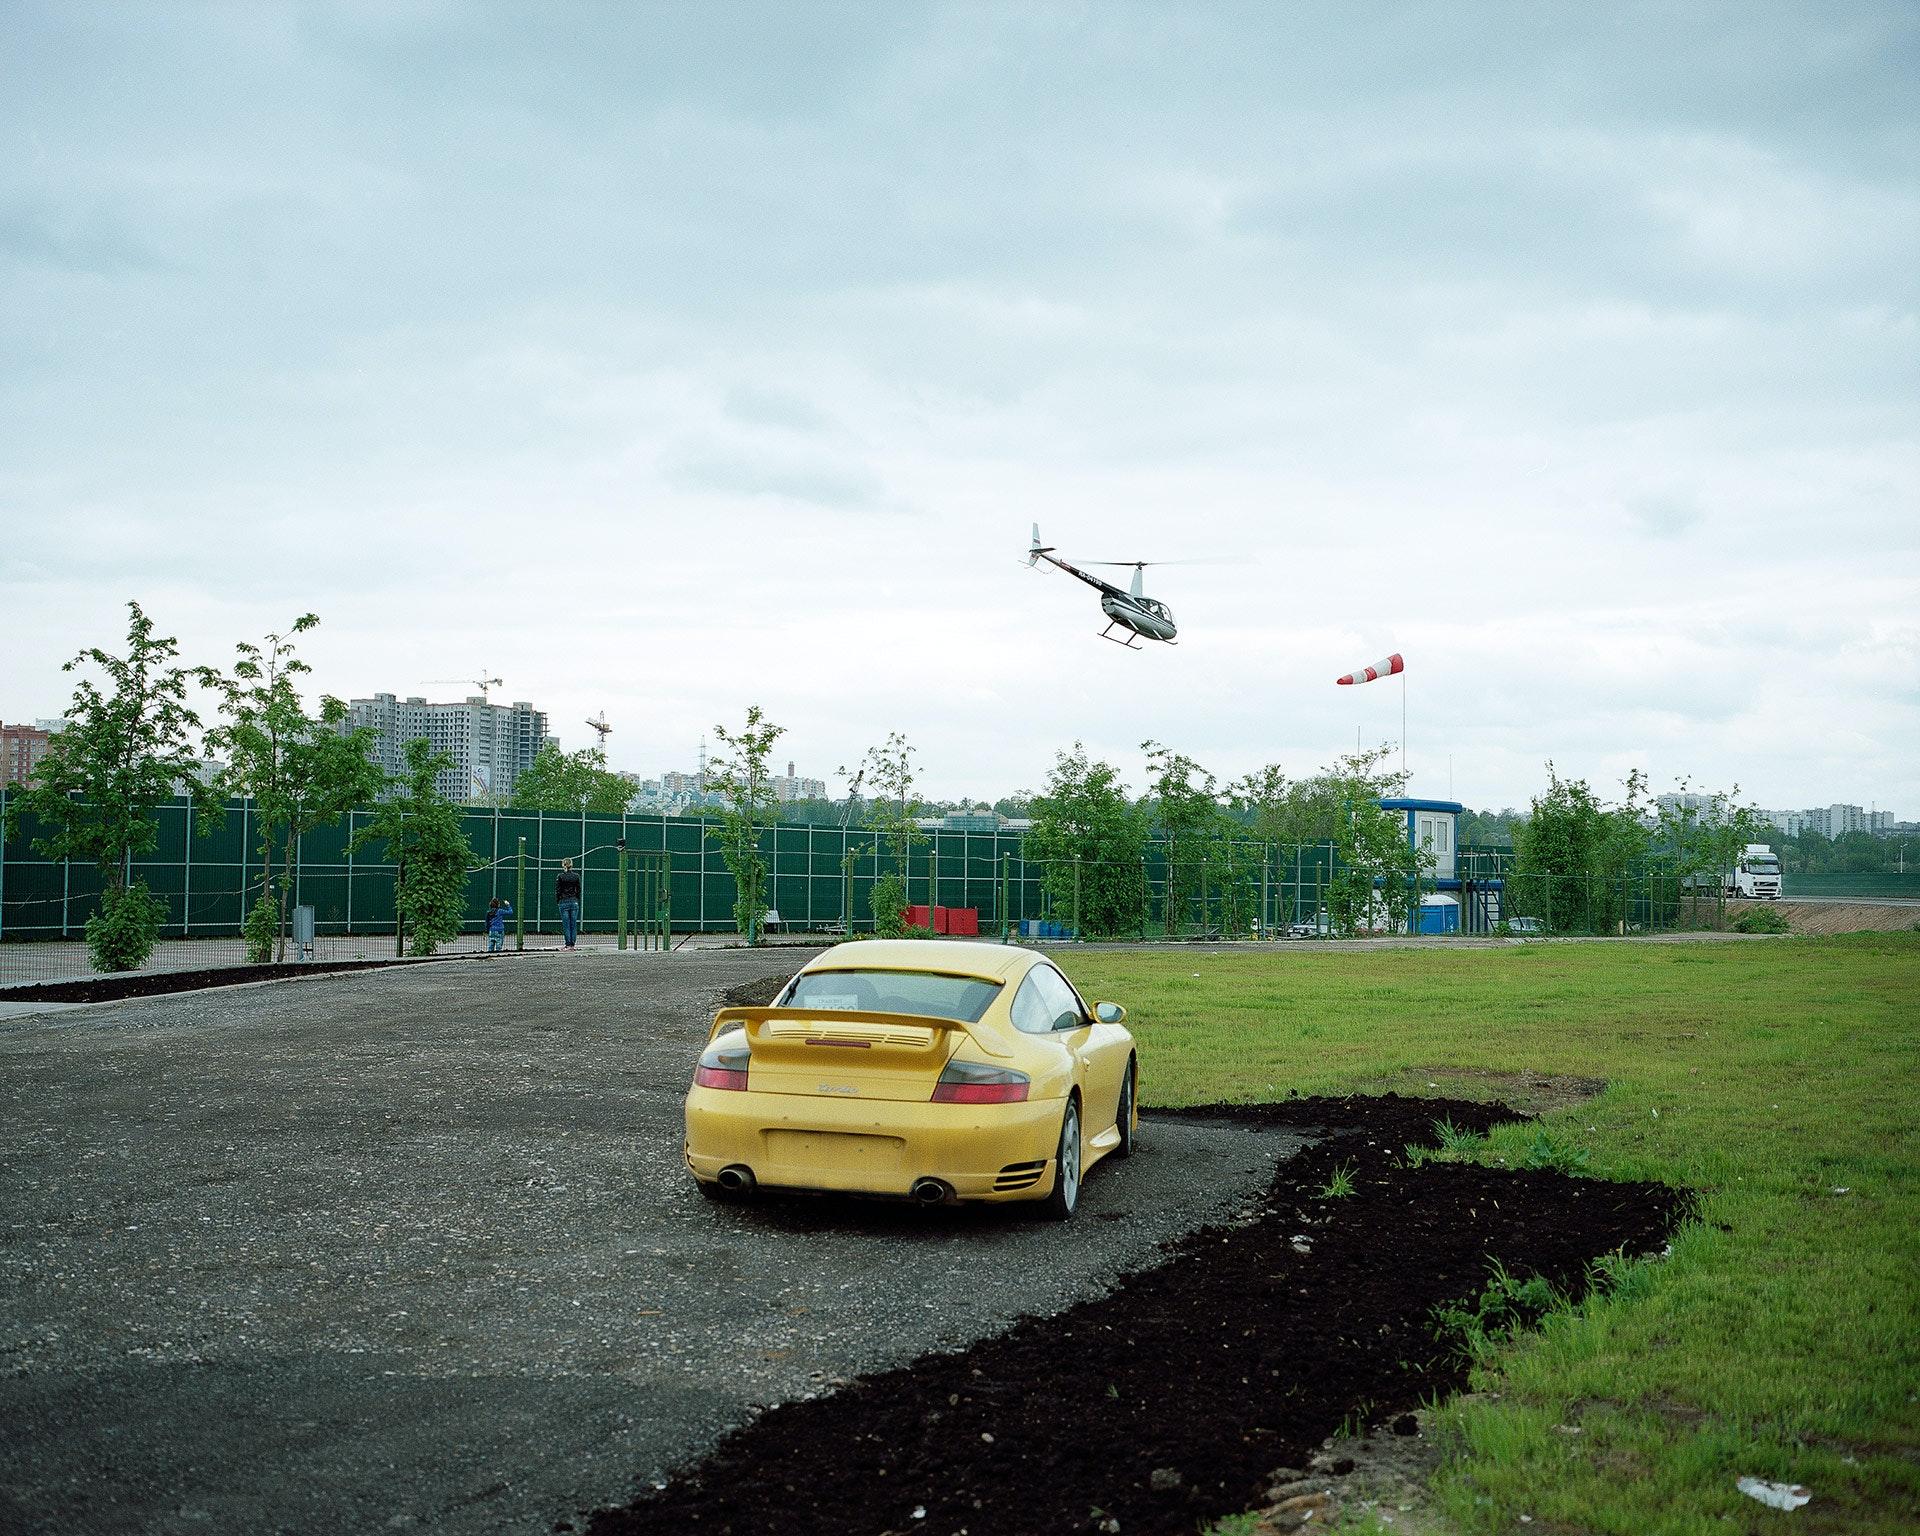 Petr_Antonov_Trees,-cars,-figures-of-people,-assorted-barriers_2